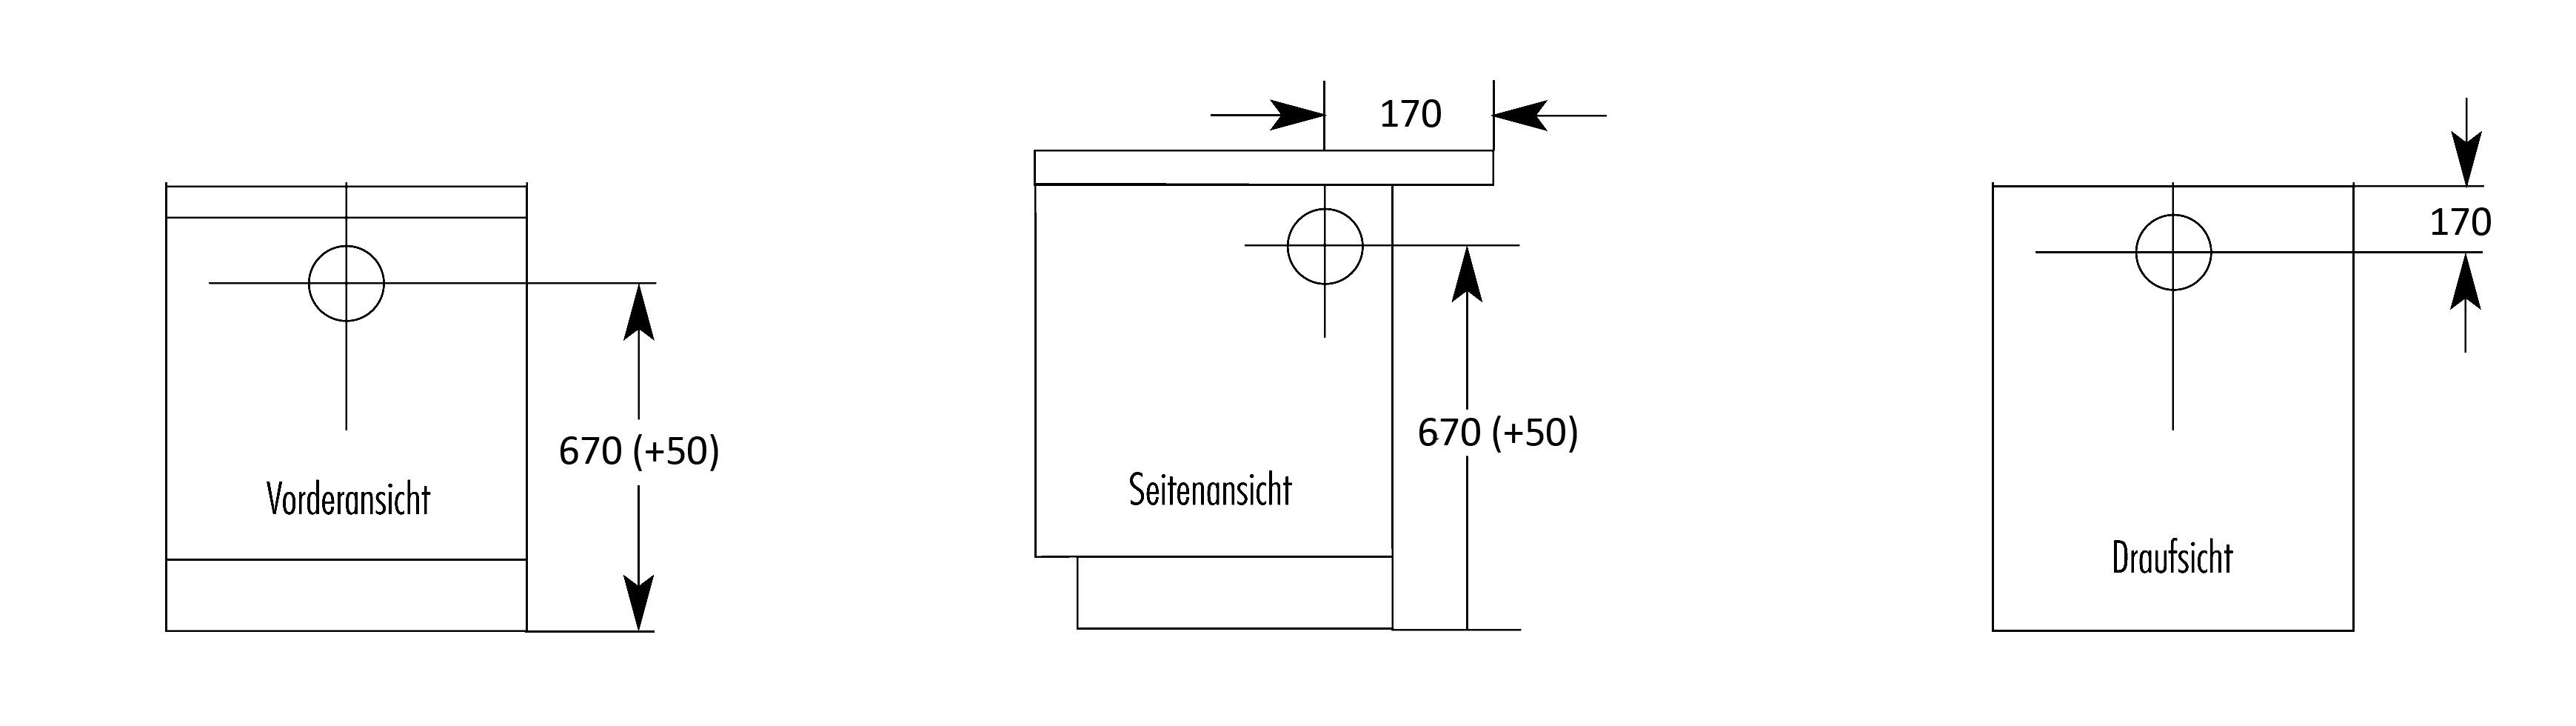 Küchenherd / Kohleherd Wamsler K150S maron Stahlkochfeld Bild 2